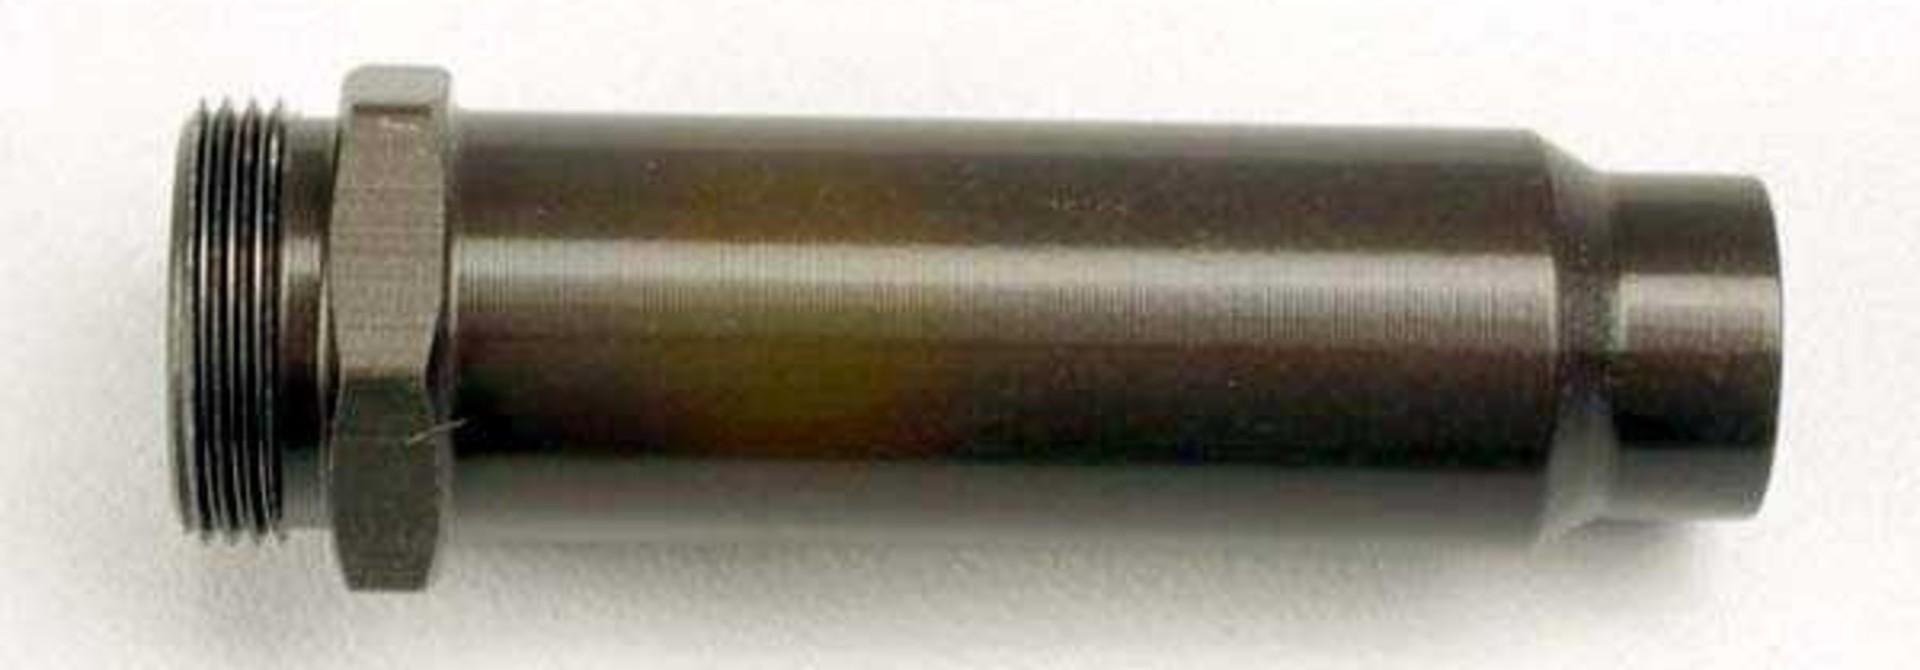 Big Bore shock cylinder (XX-long) (1), TRX2666